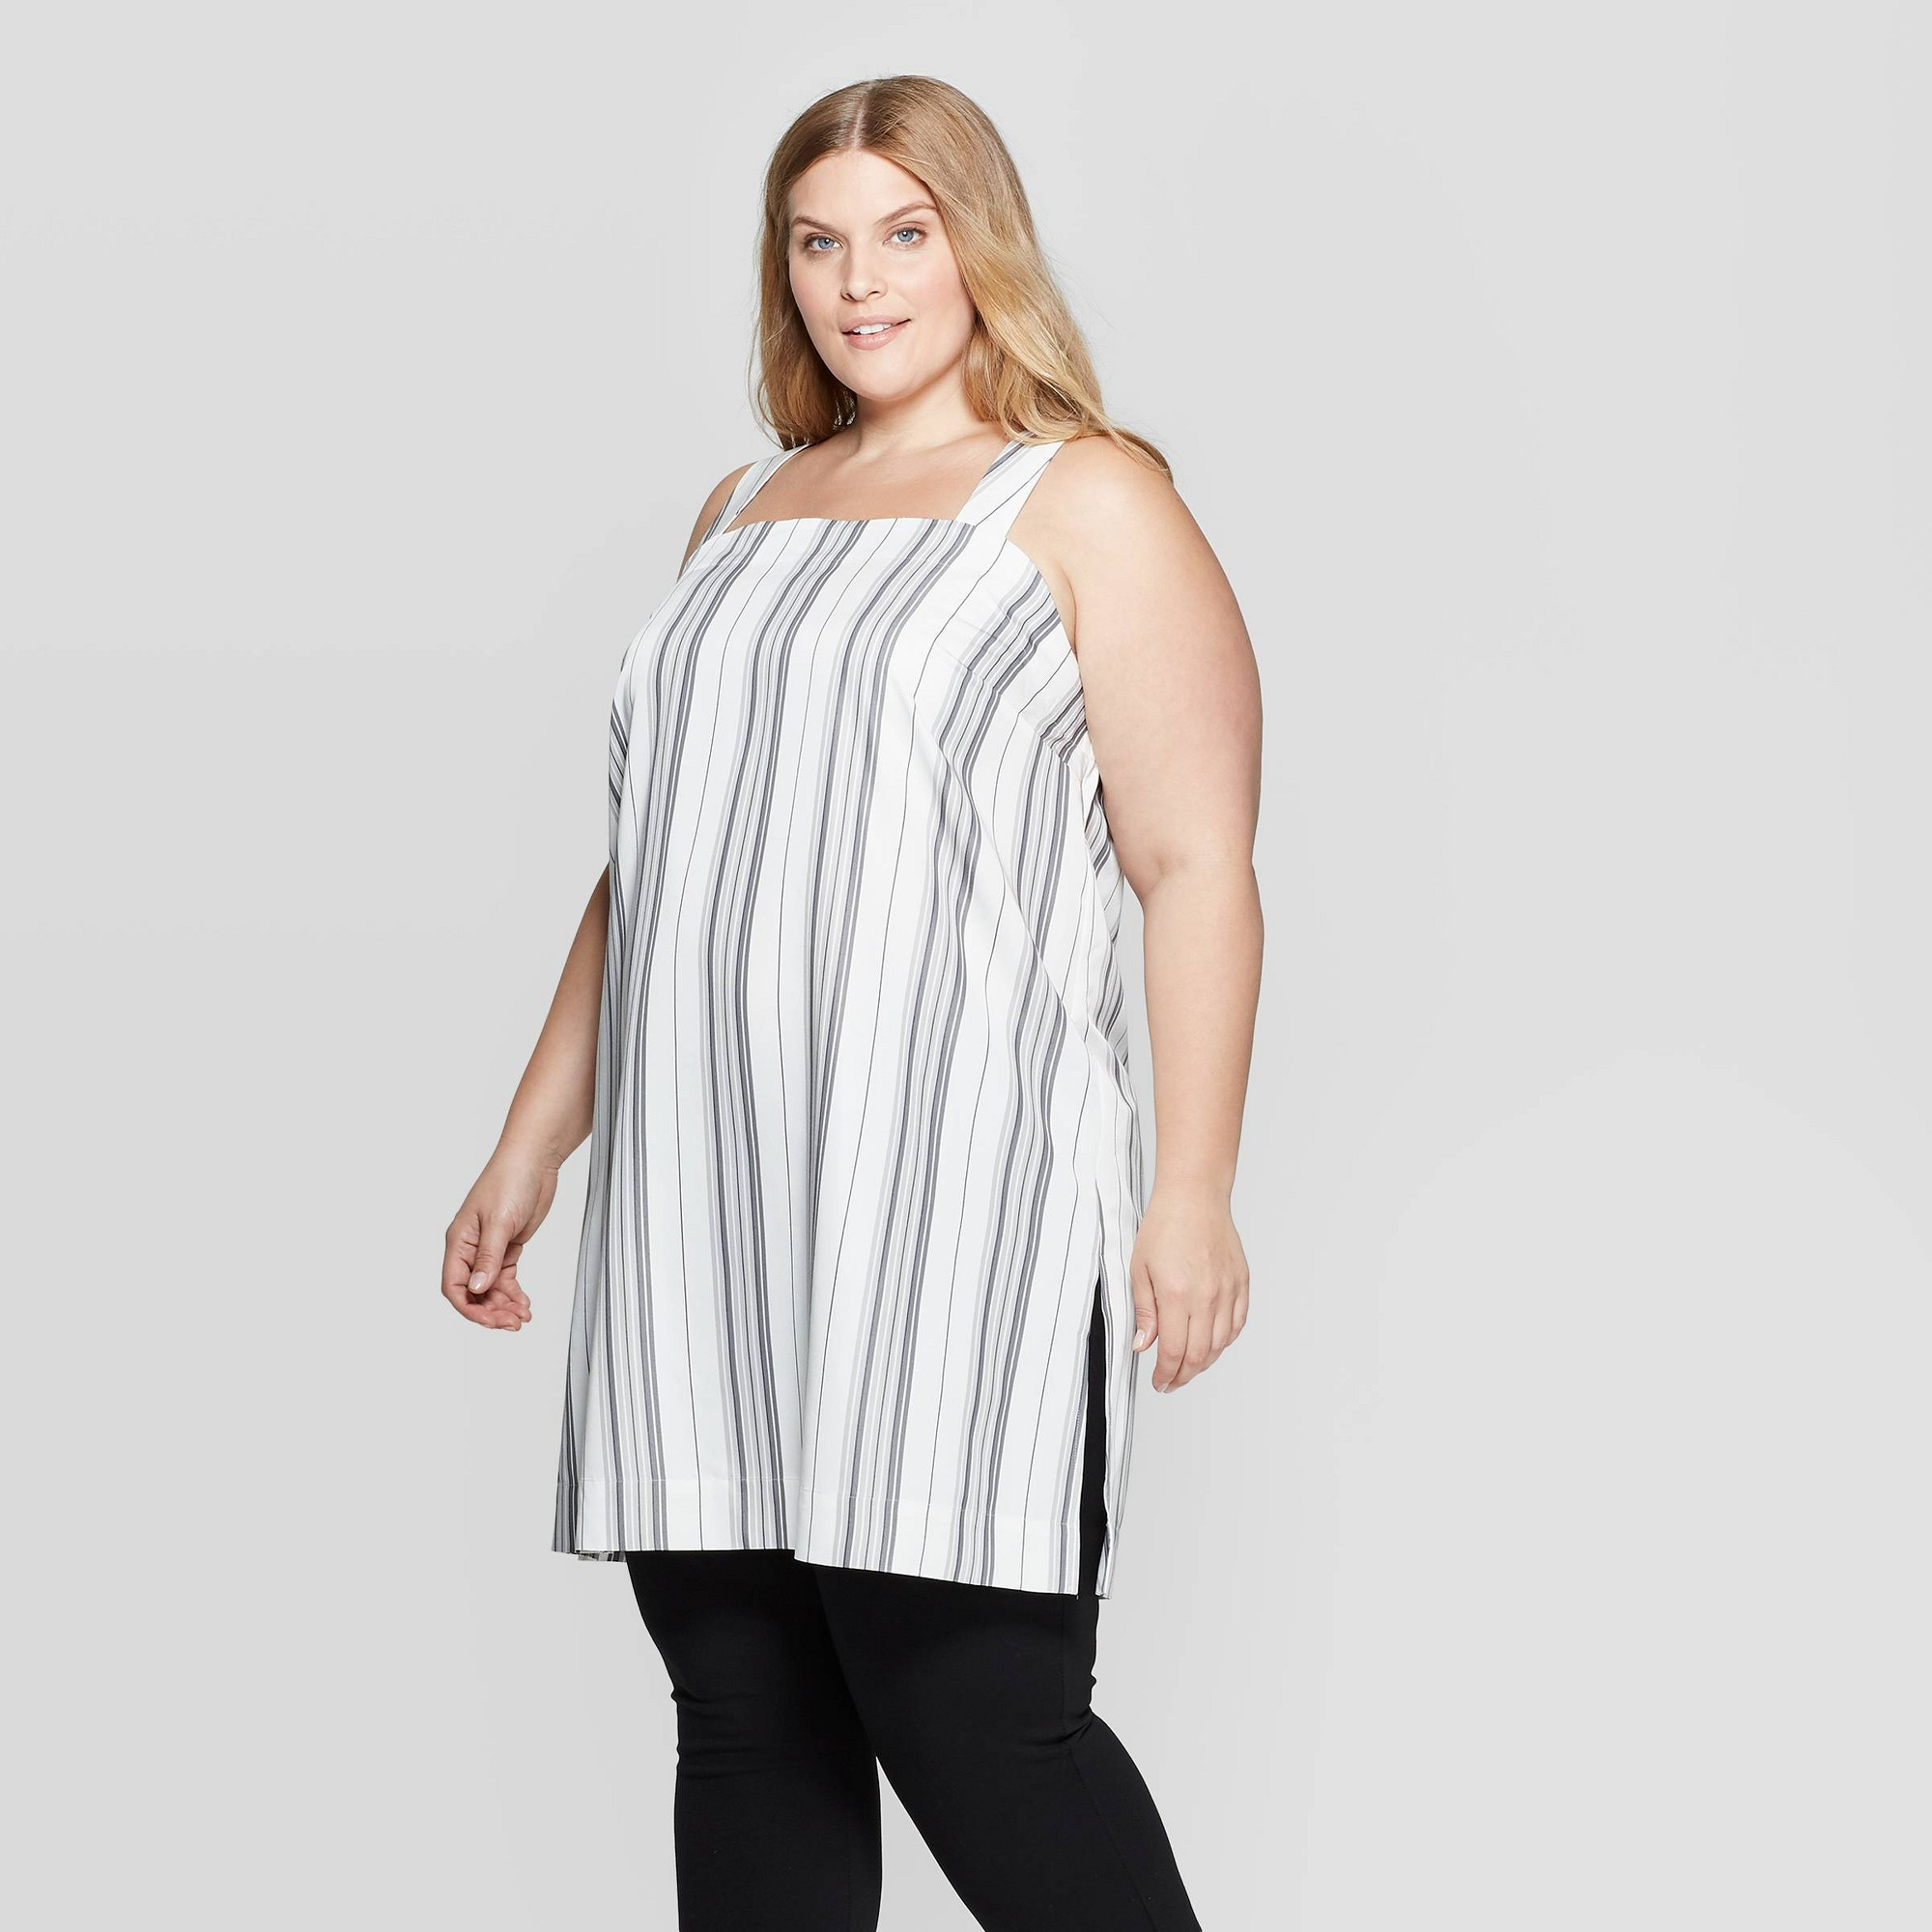 Women's Plus Size Striped Sleeveless Square Neck Stripe Tunic Blouse - Prologue Gray Stripe X, White